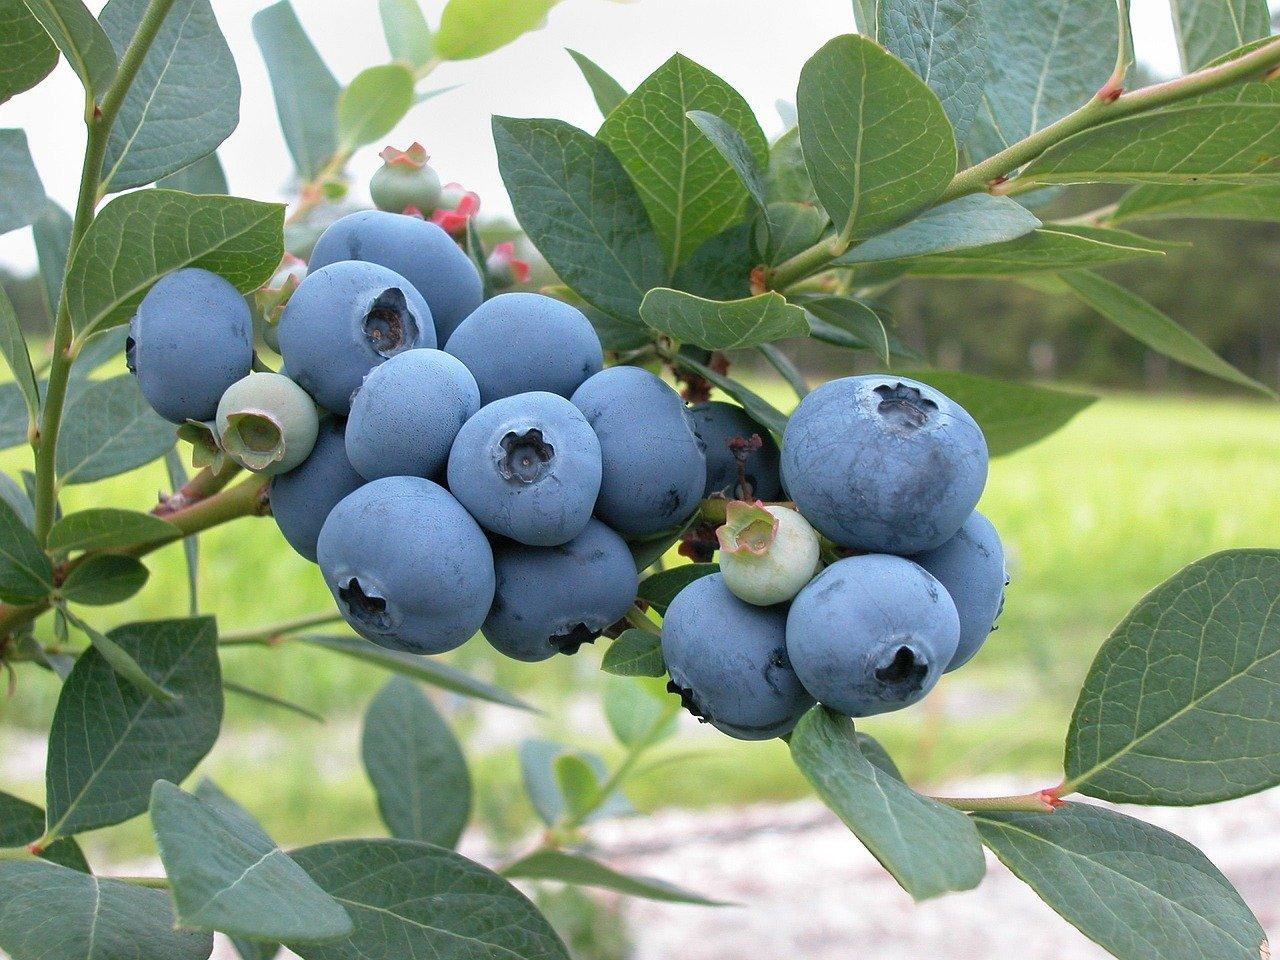 New Zealand's blueberry exports